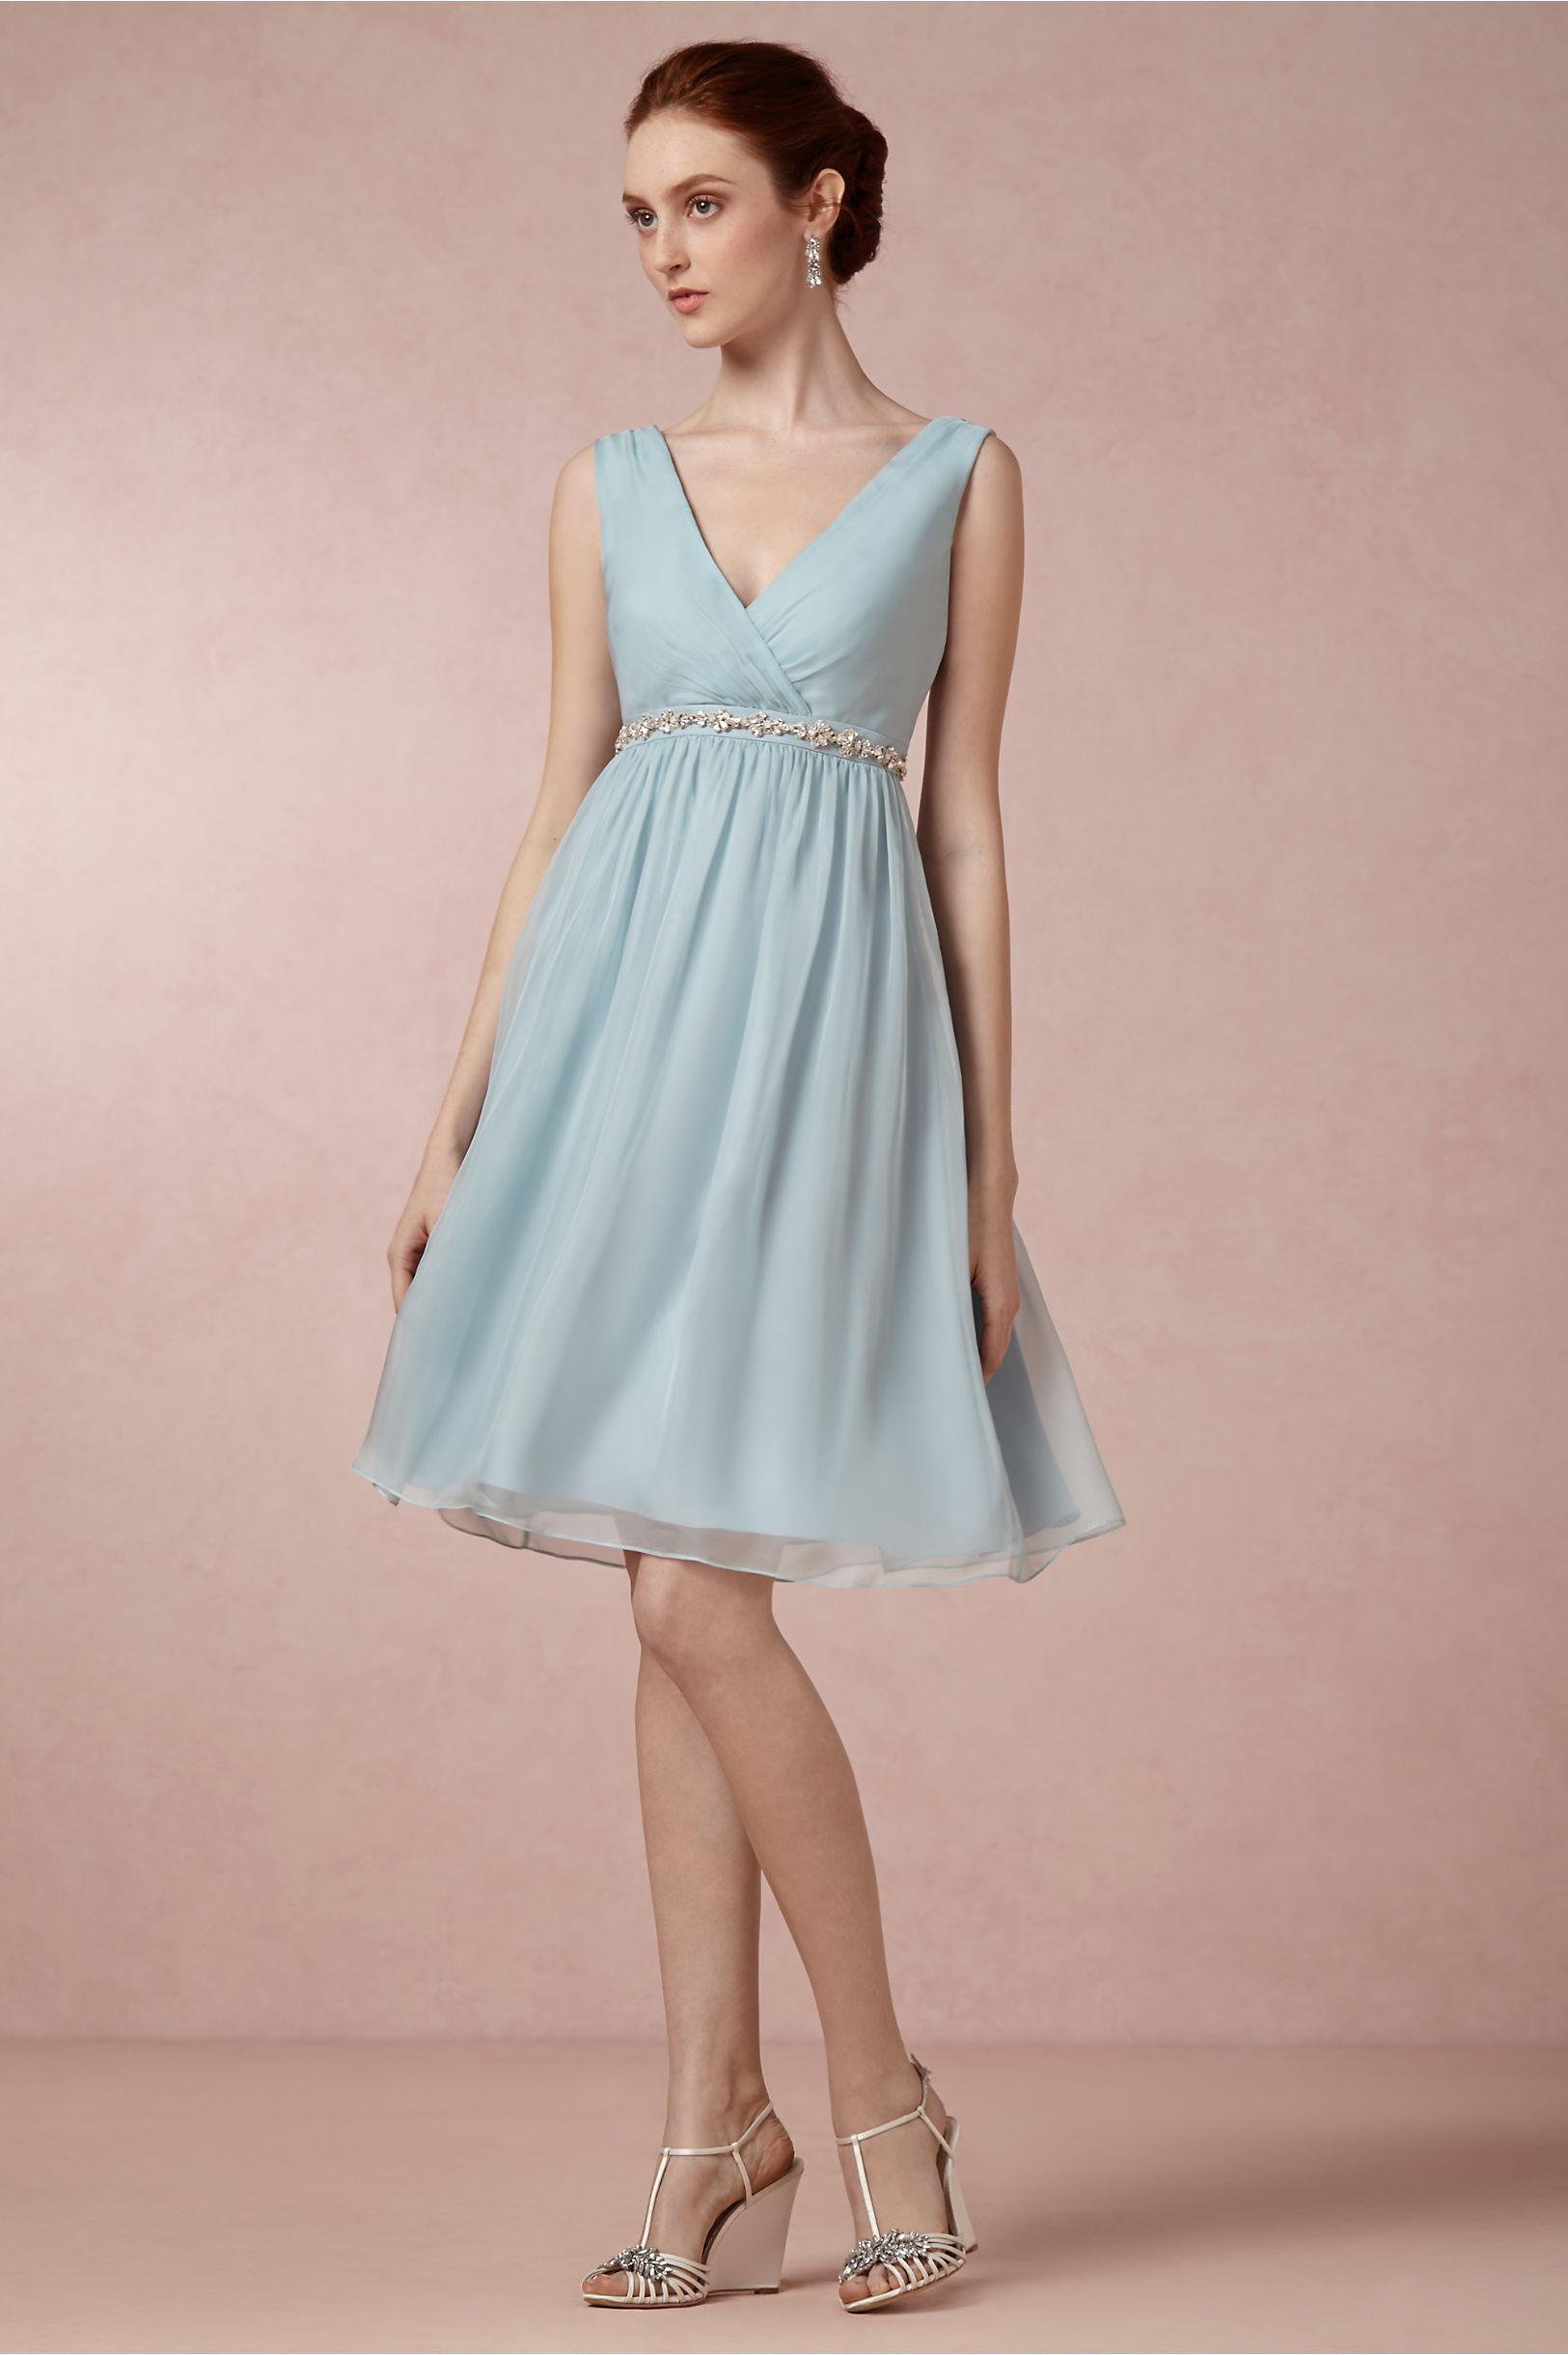 Rosalie Dress in Bridesmaids & Bridal Party | BHLDN